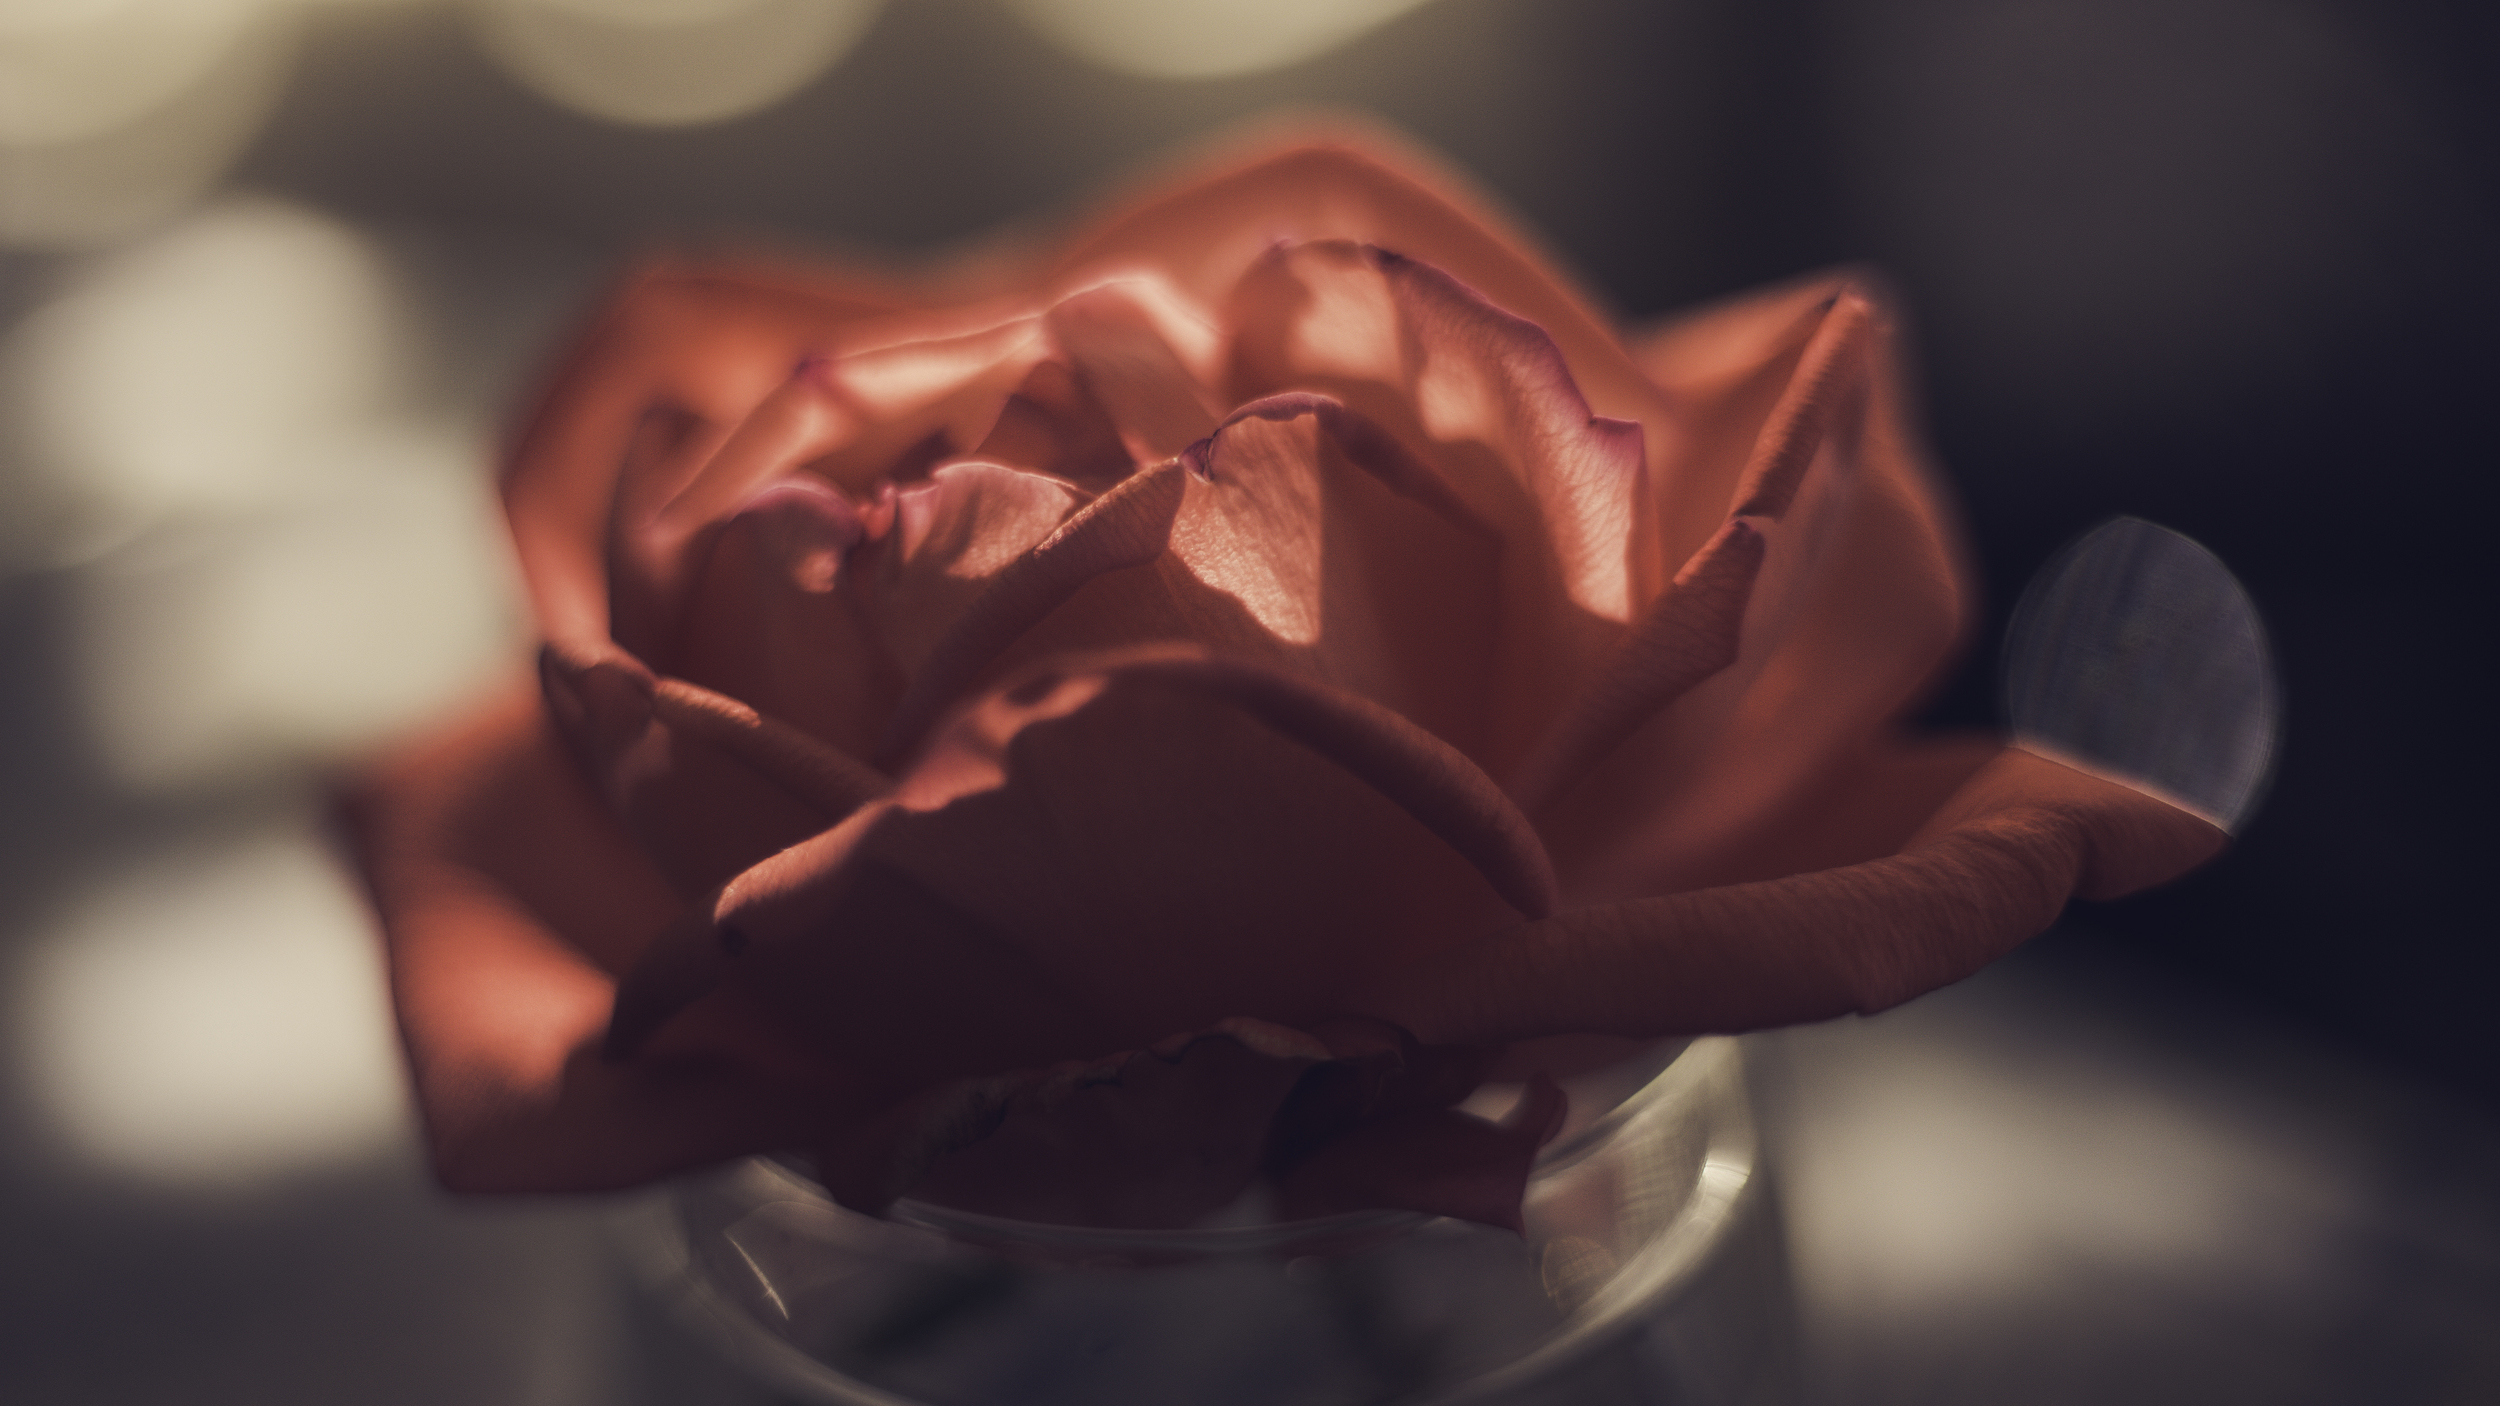 Rose   Shot on lensbender